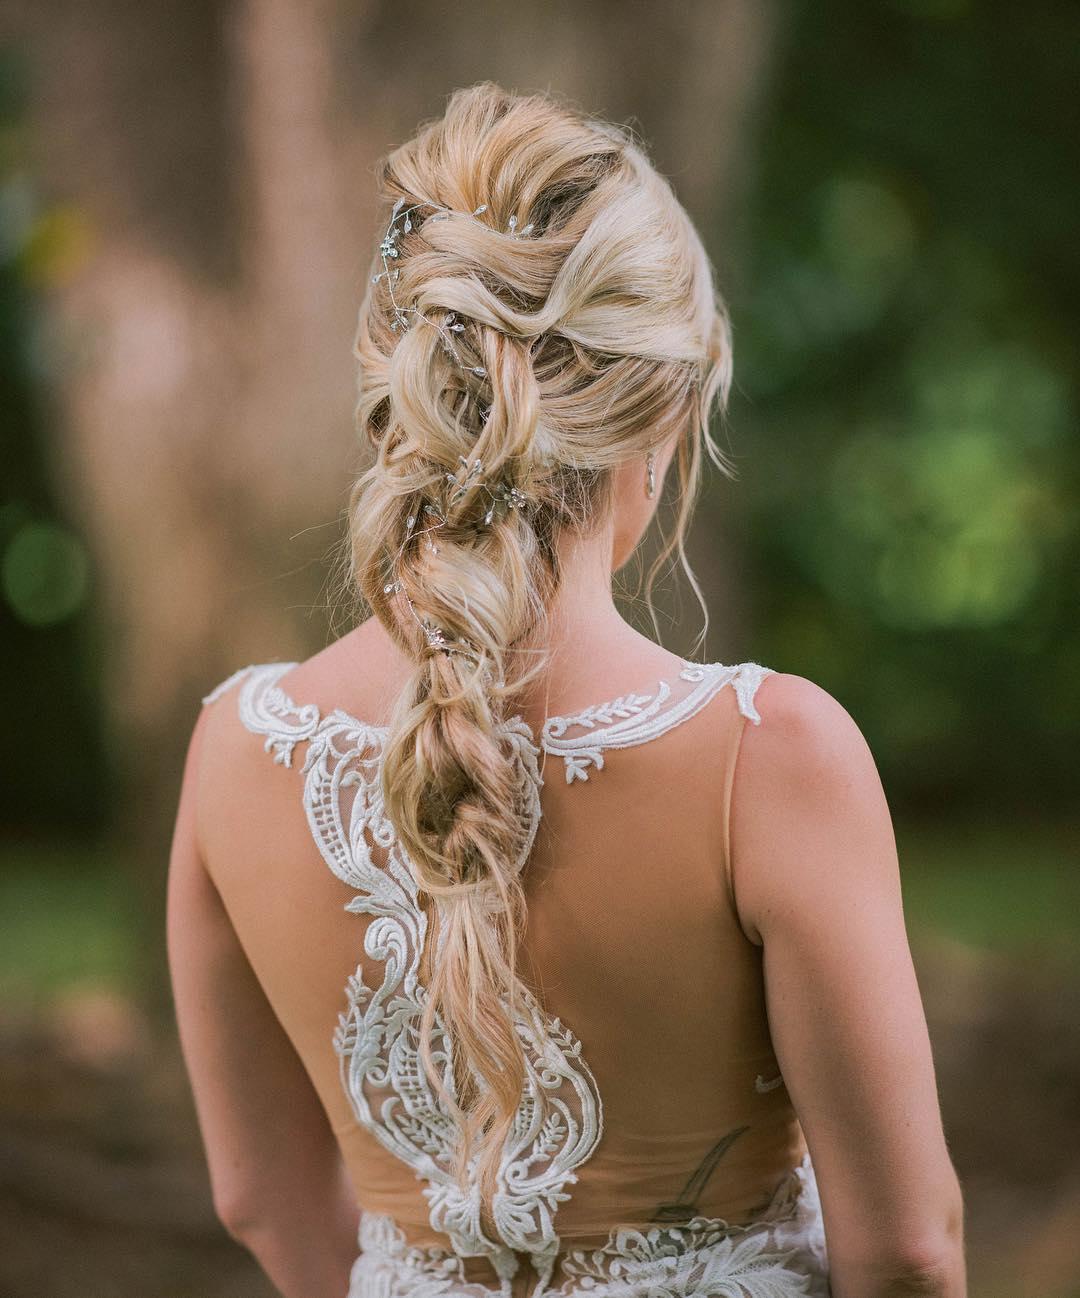 4 Well Travelled Bride Love and Beauty Maui Wedding Hair and Makeup Hawaii.jpg